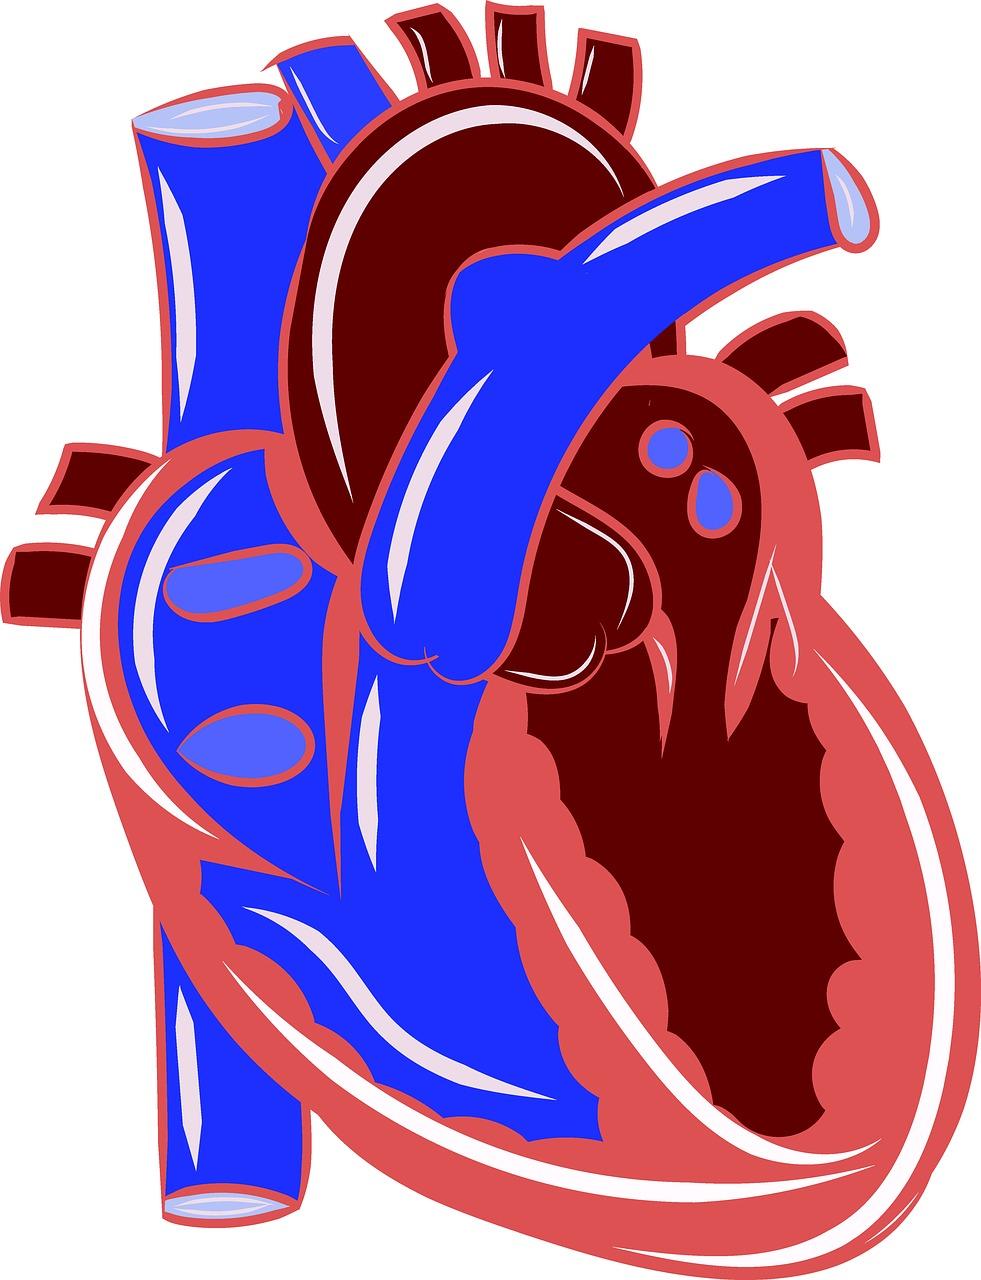 Heart,anatomy,circulatory,health,medical - free image from needpix.com